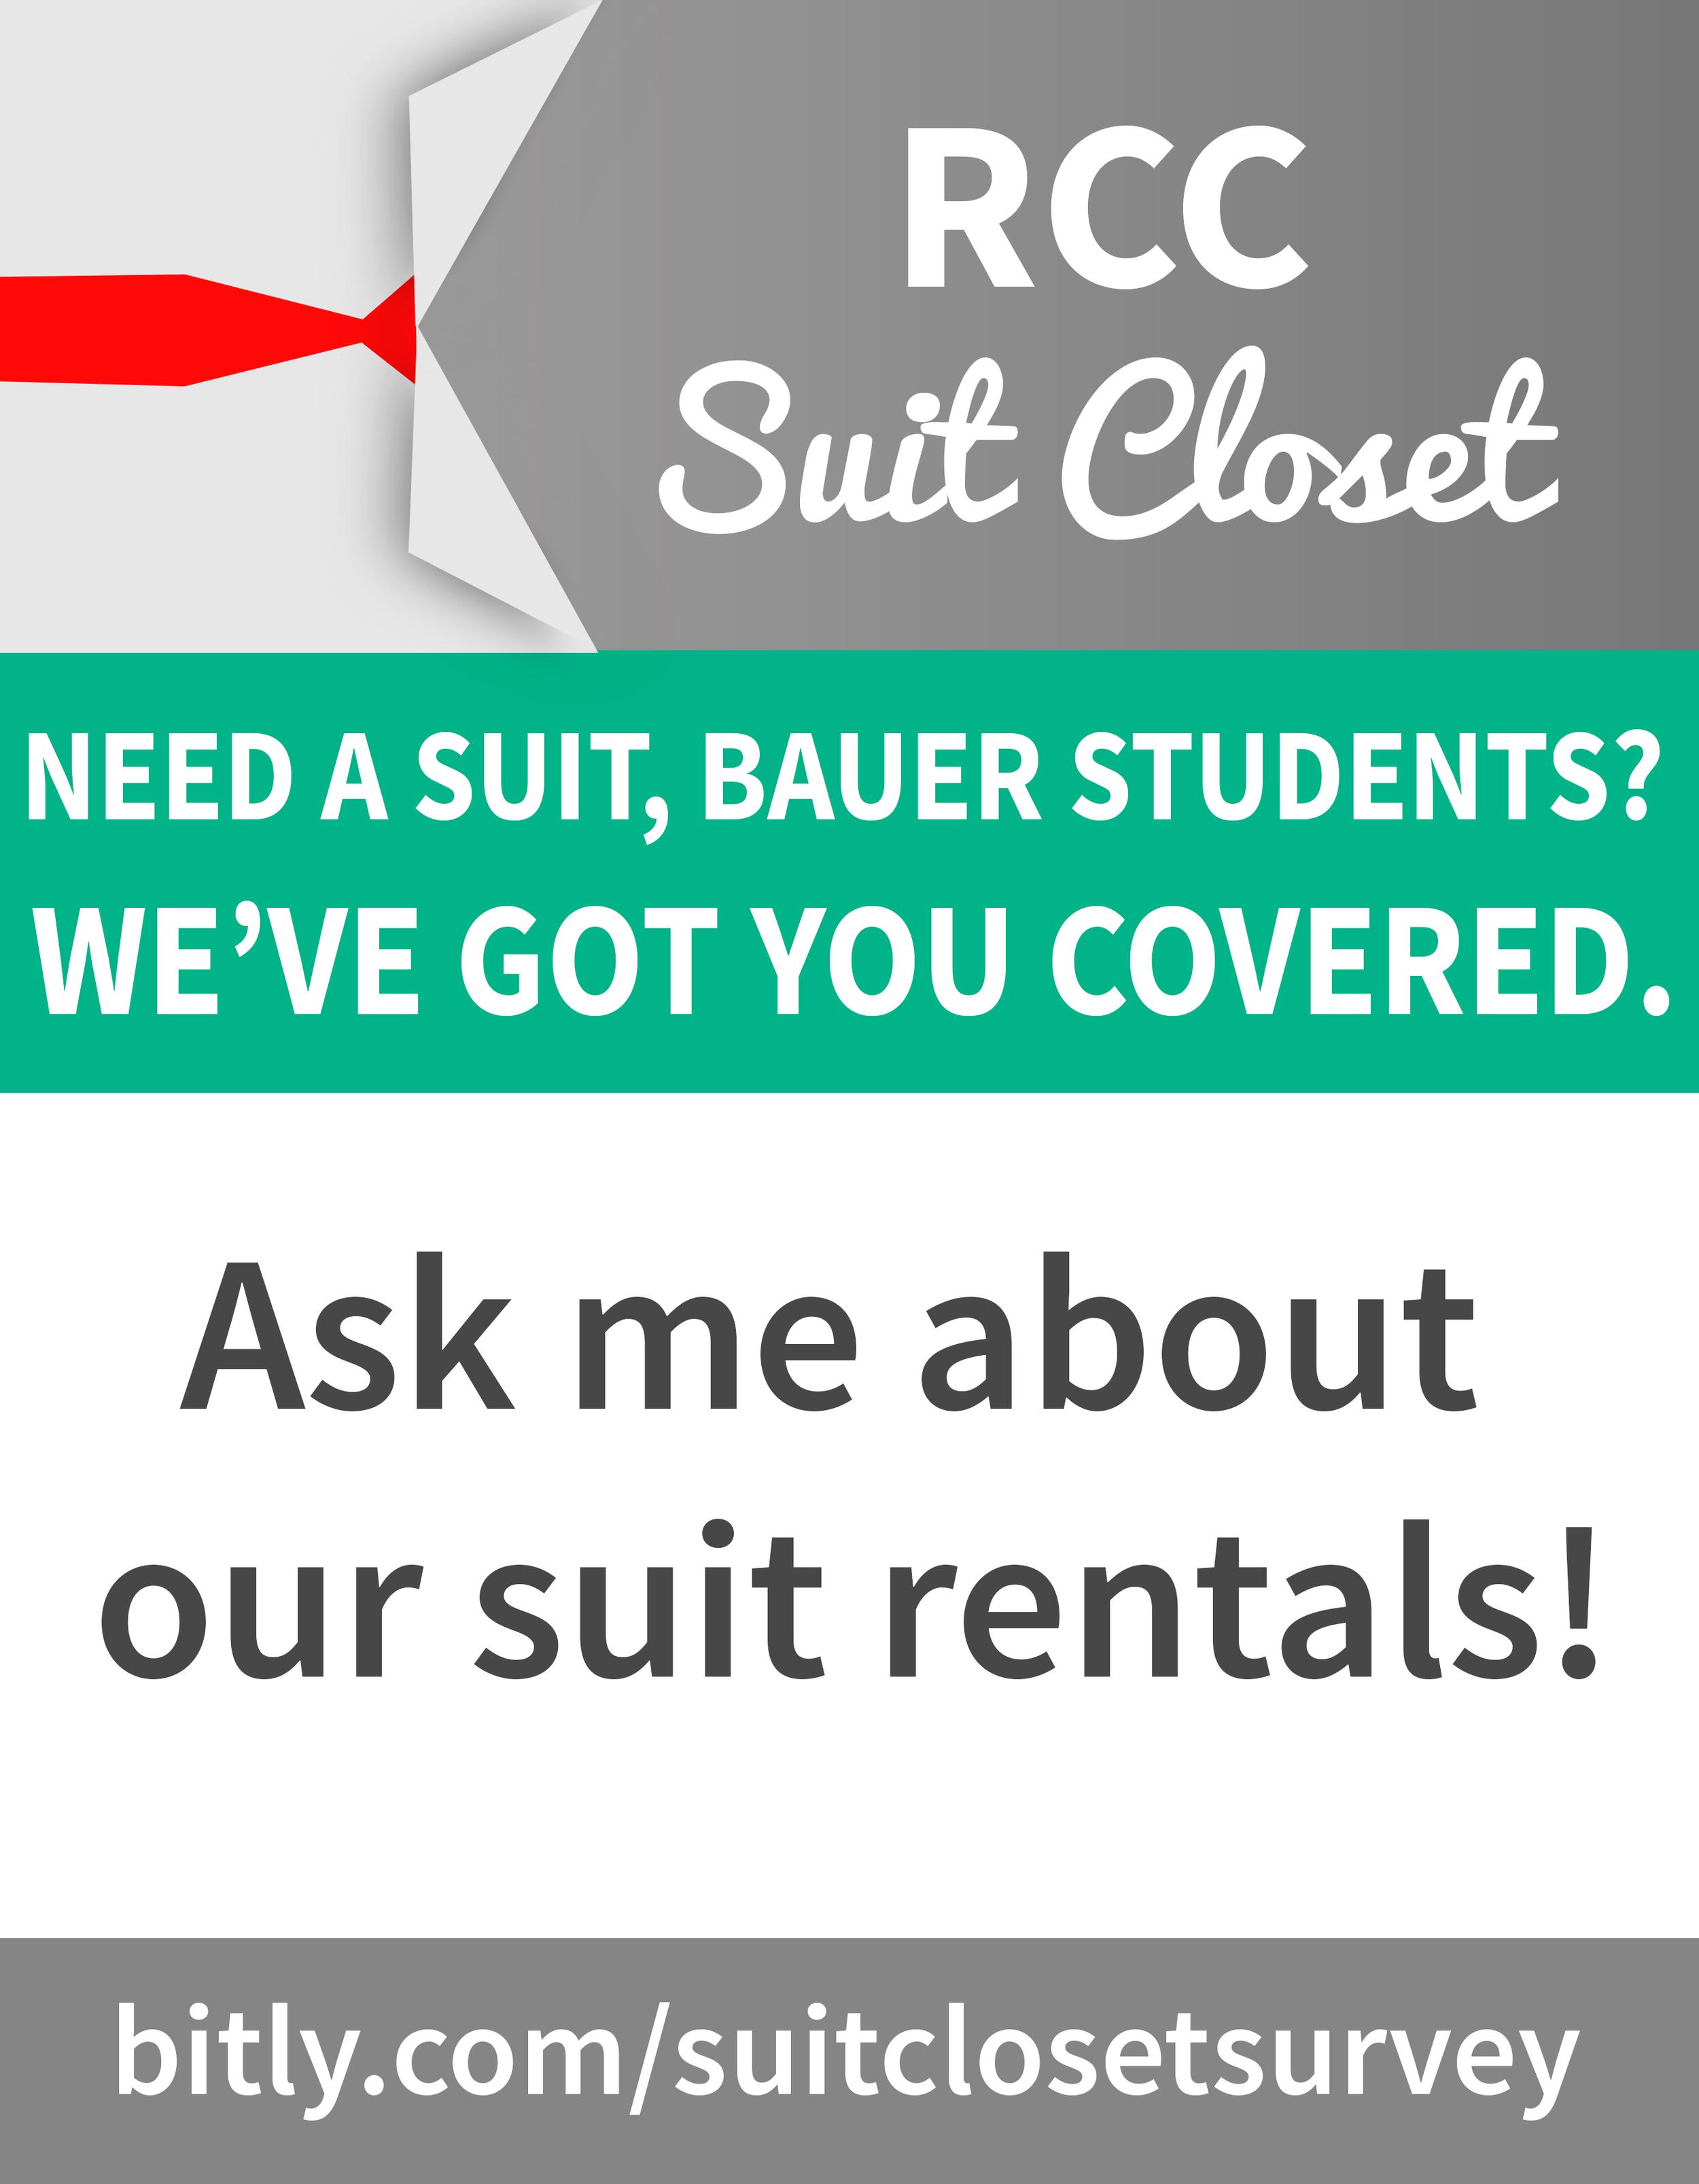 RCC Suit closet career counselors color.jpg